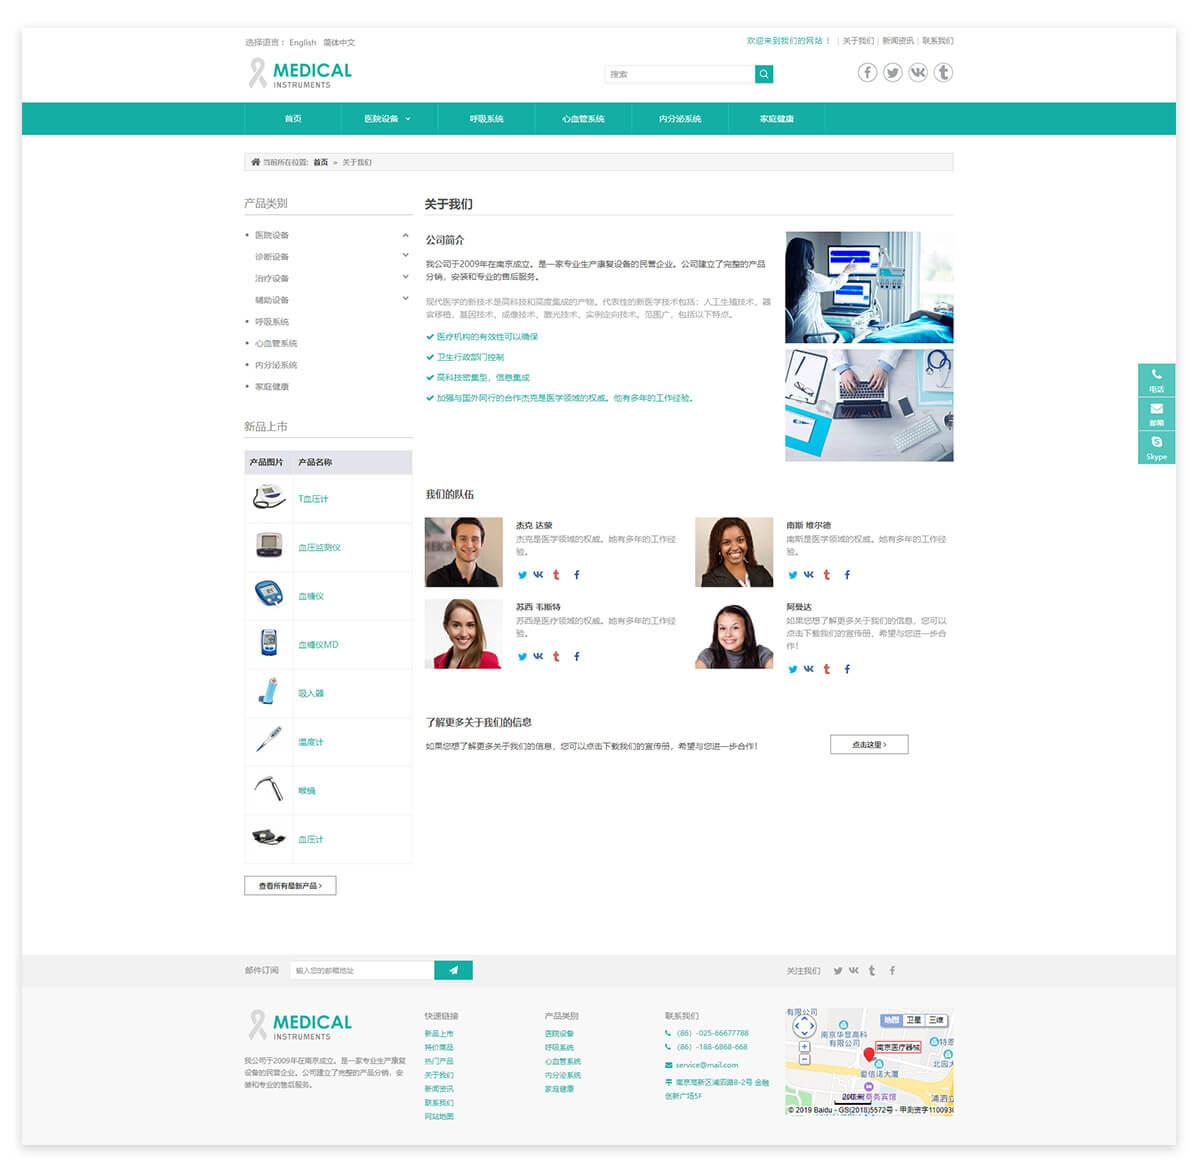 医疗设备案例---南京MEDICAL_03